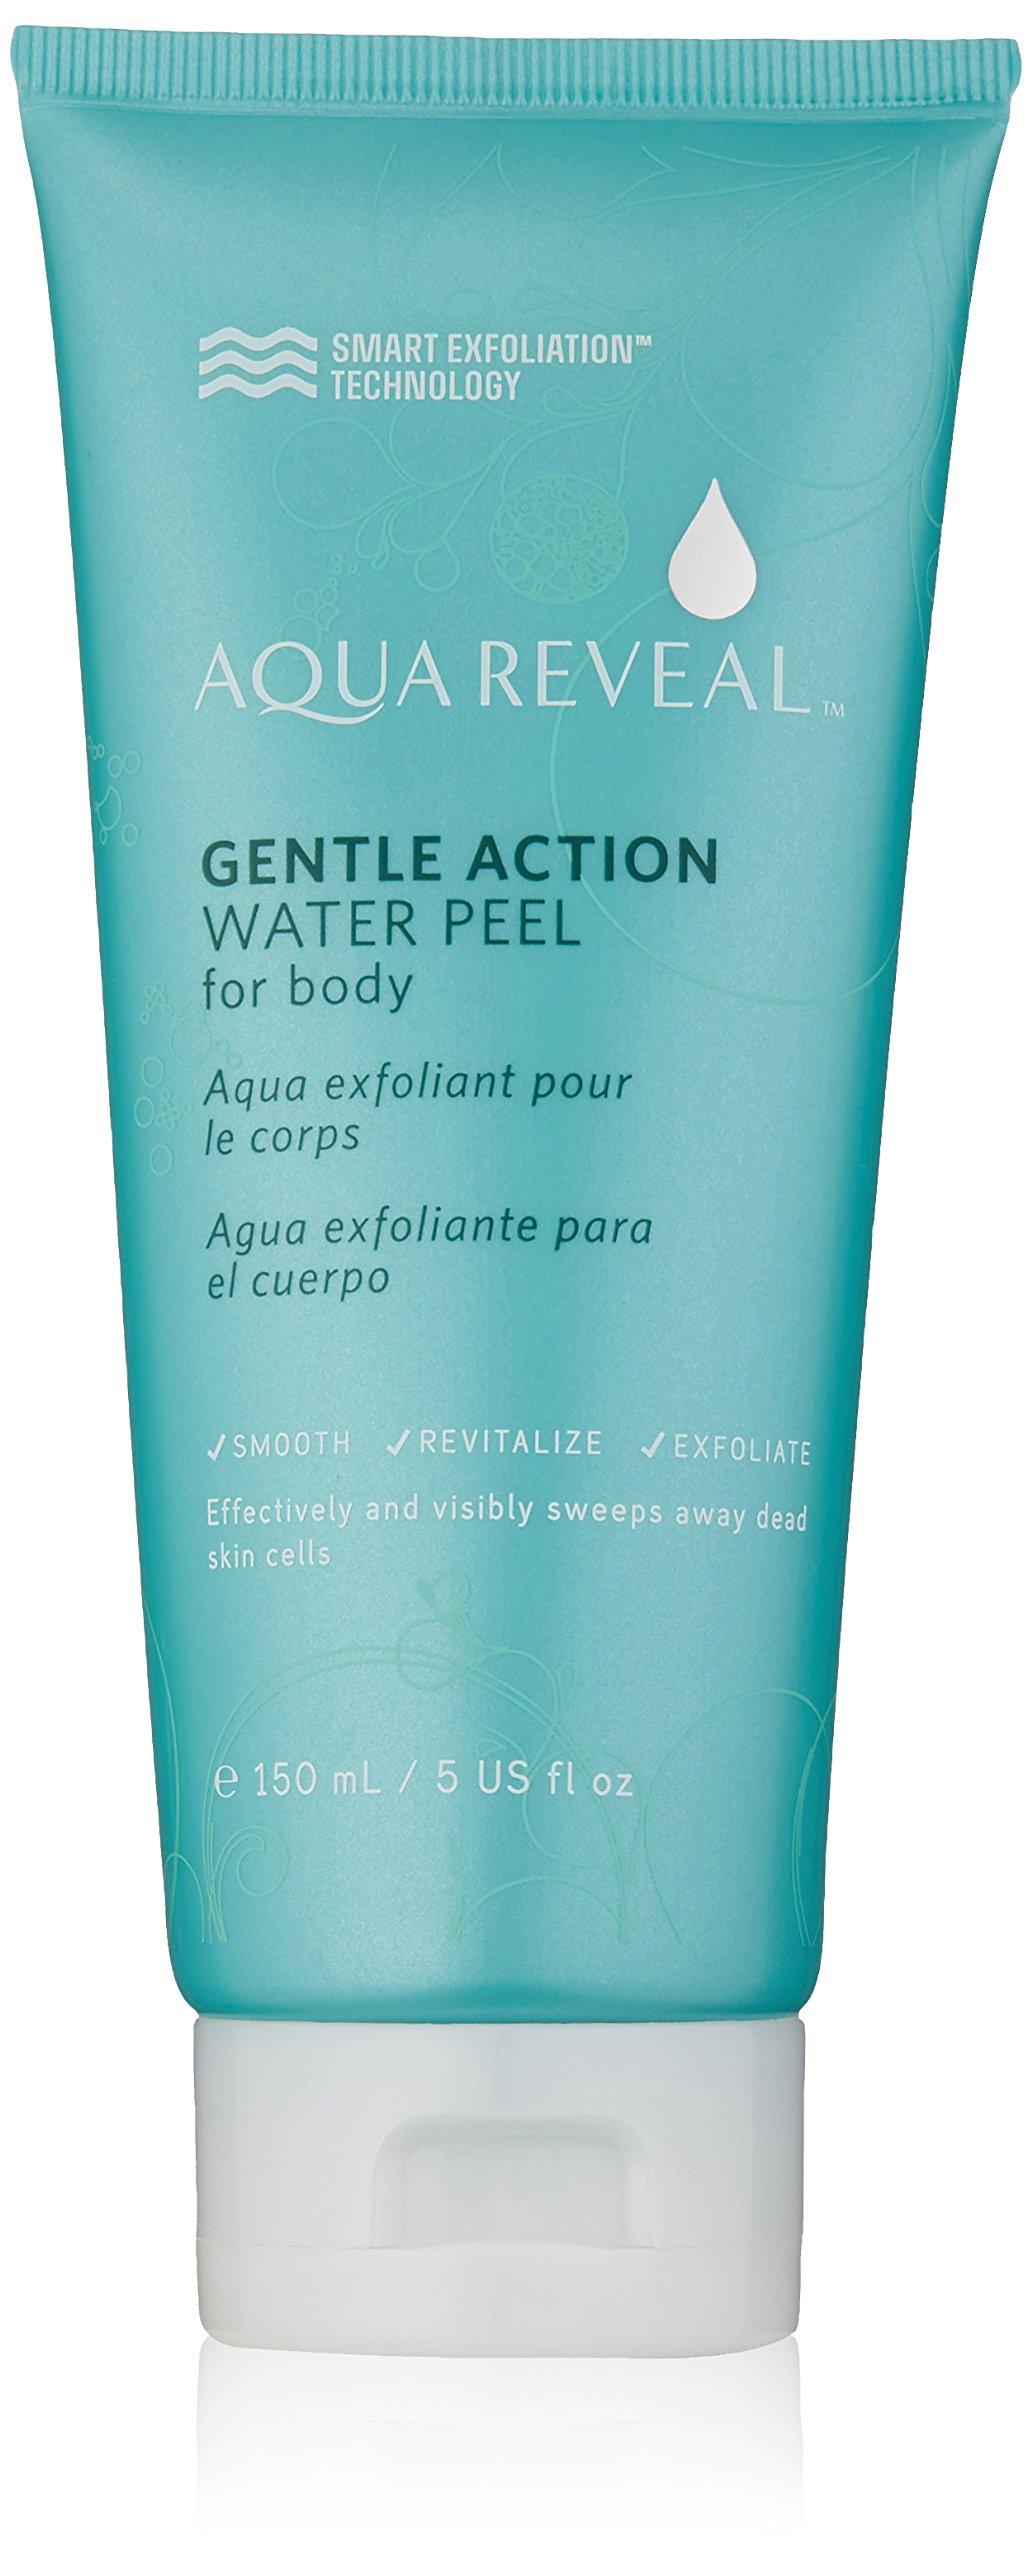 Aquareveal Gentle Action Water Peel for Body | exfoliator for feet, elbows, knees, hands, keratosis pilaris | 95% organic/natural Korean peeling gel/gommage (no scrub body exfoliator) | 150 ml/5 fl oz